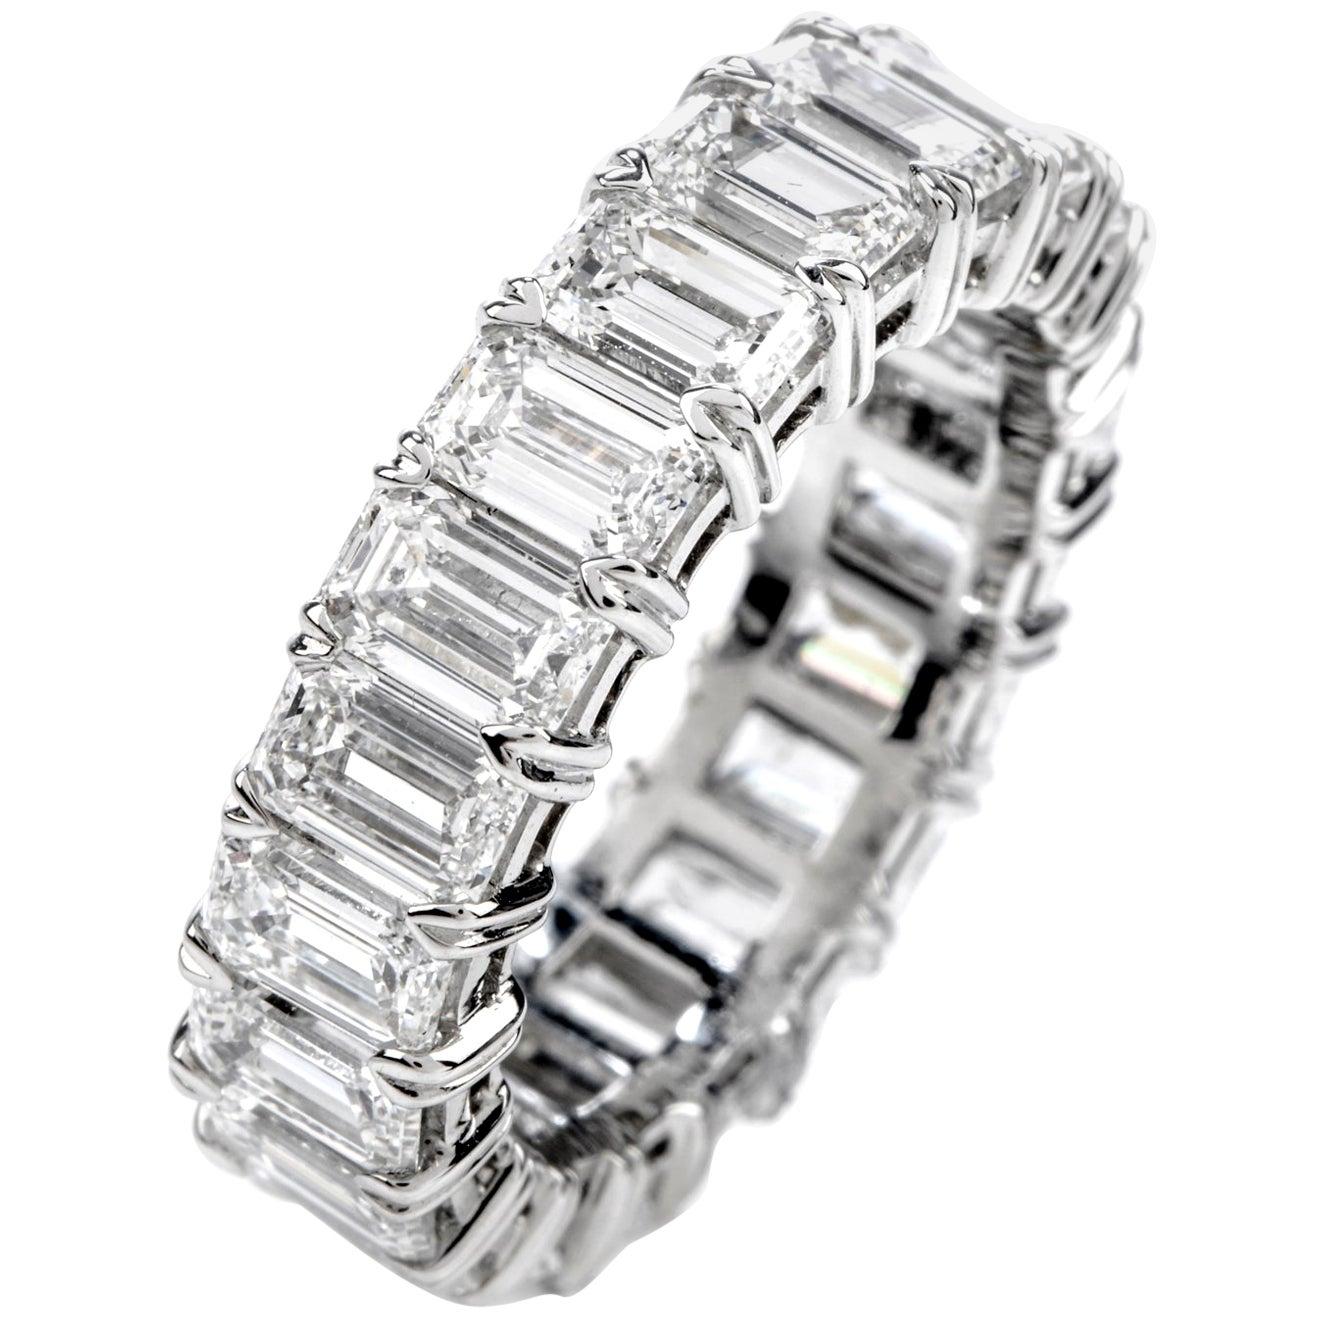 GIA 6.57 Carat D-VVS1 Emerald Cut Diamond Platinum Eternity Band Ring